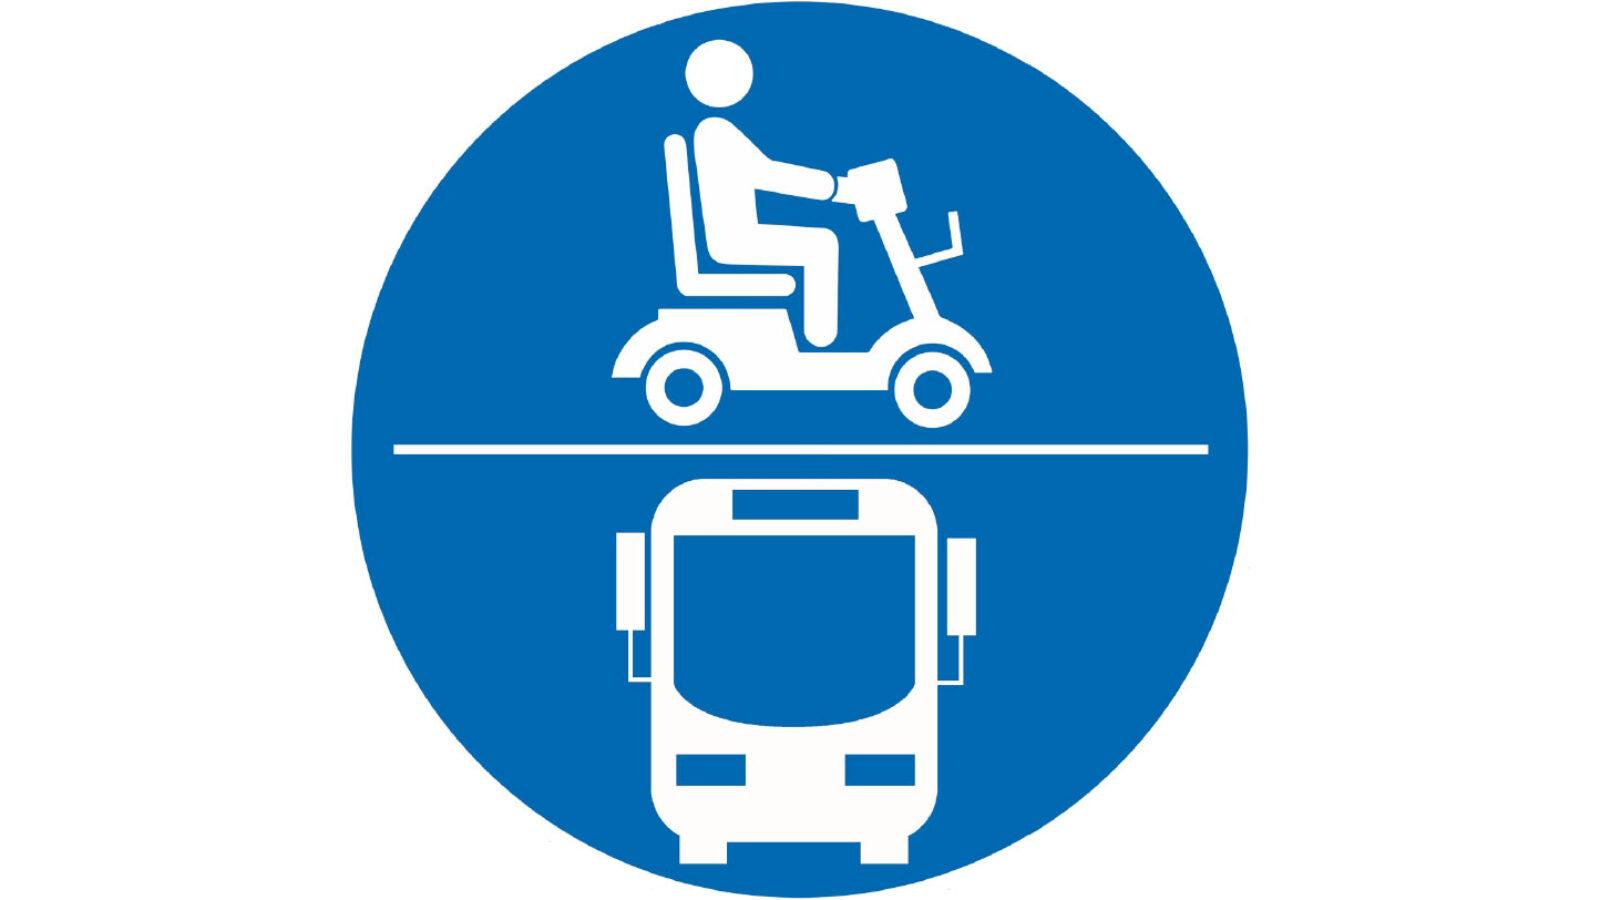 elektromobil-liebke-oepnv-bus-bahn